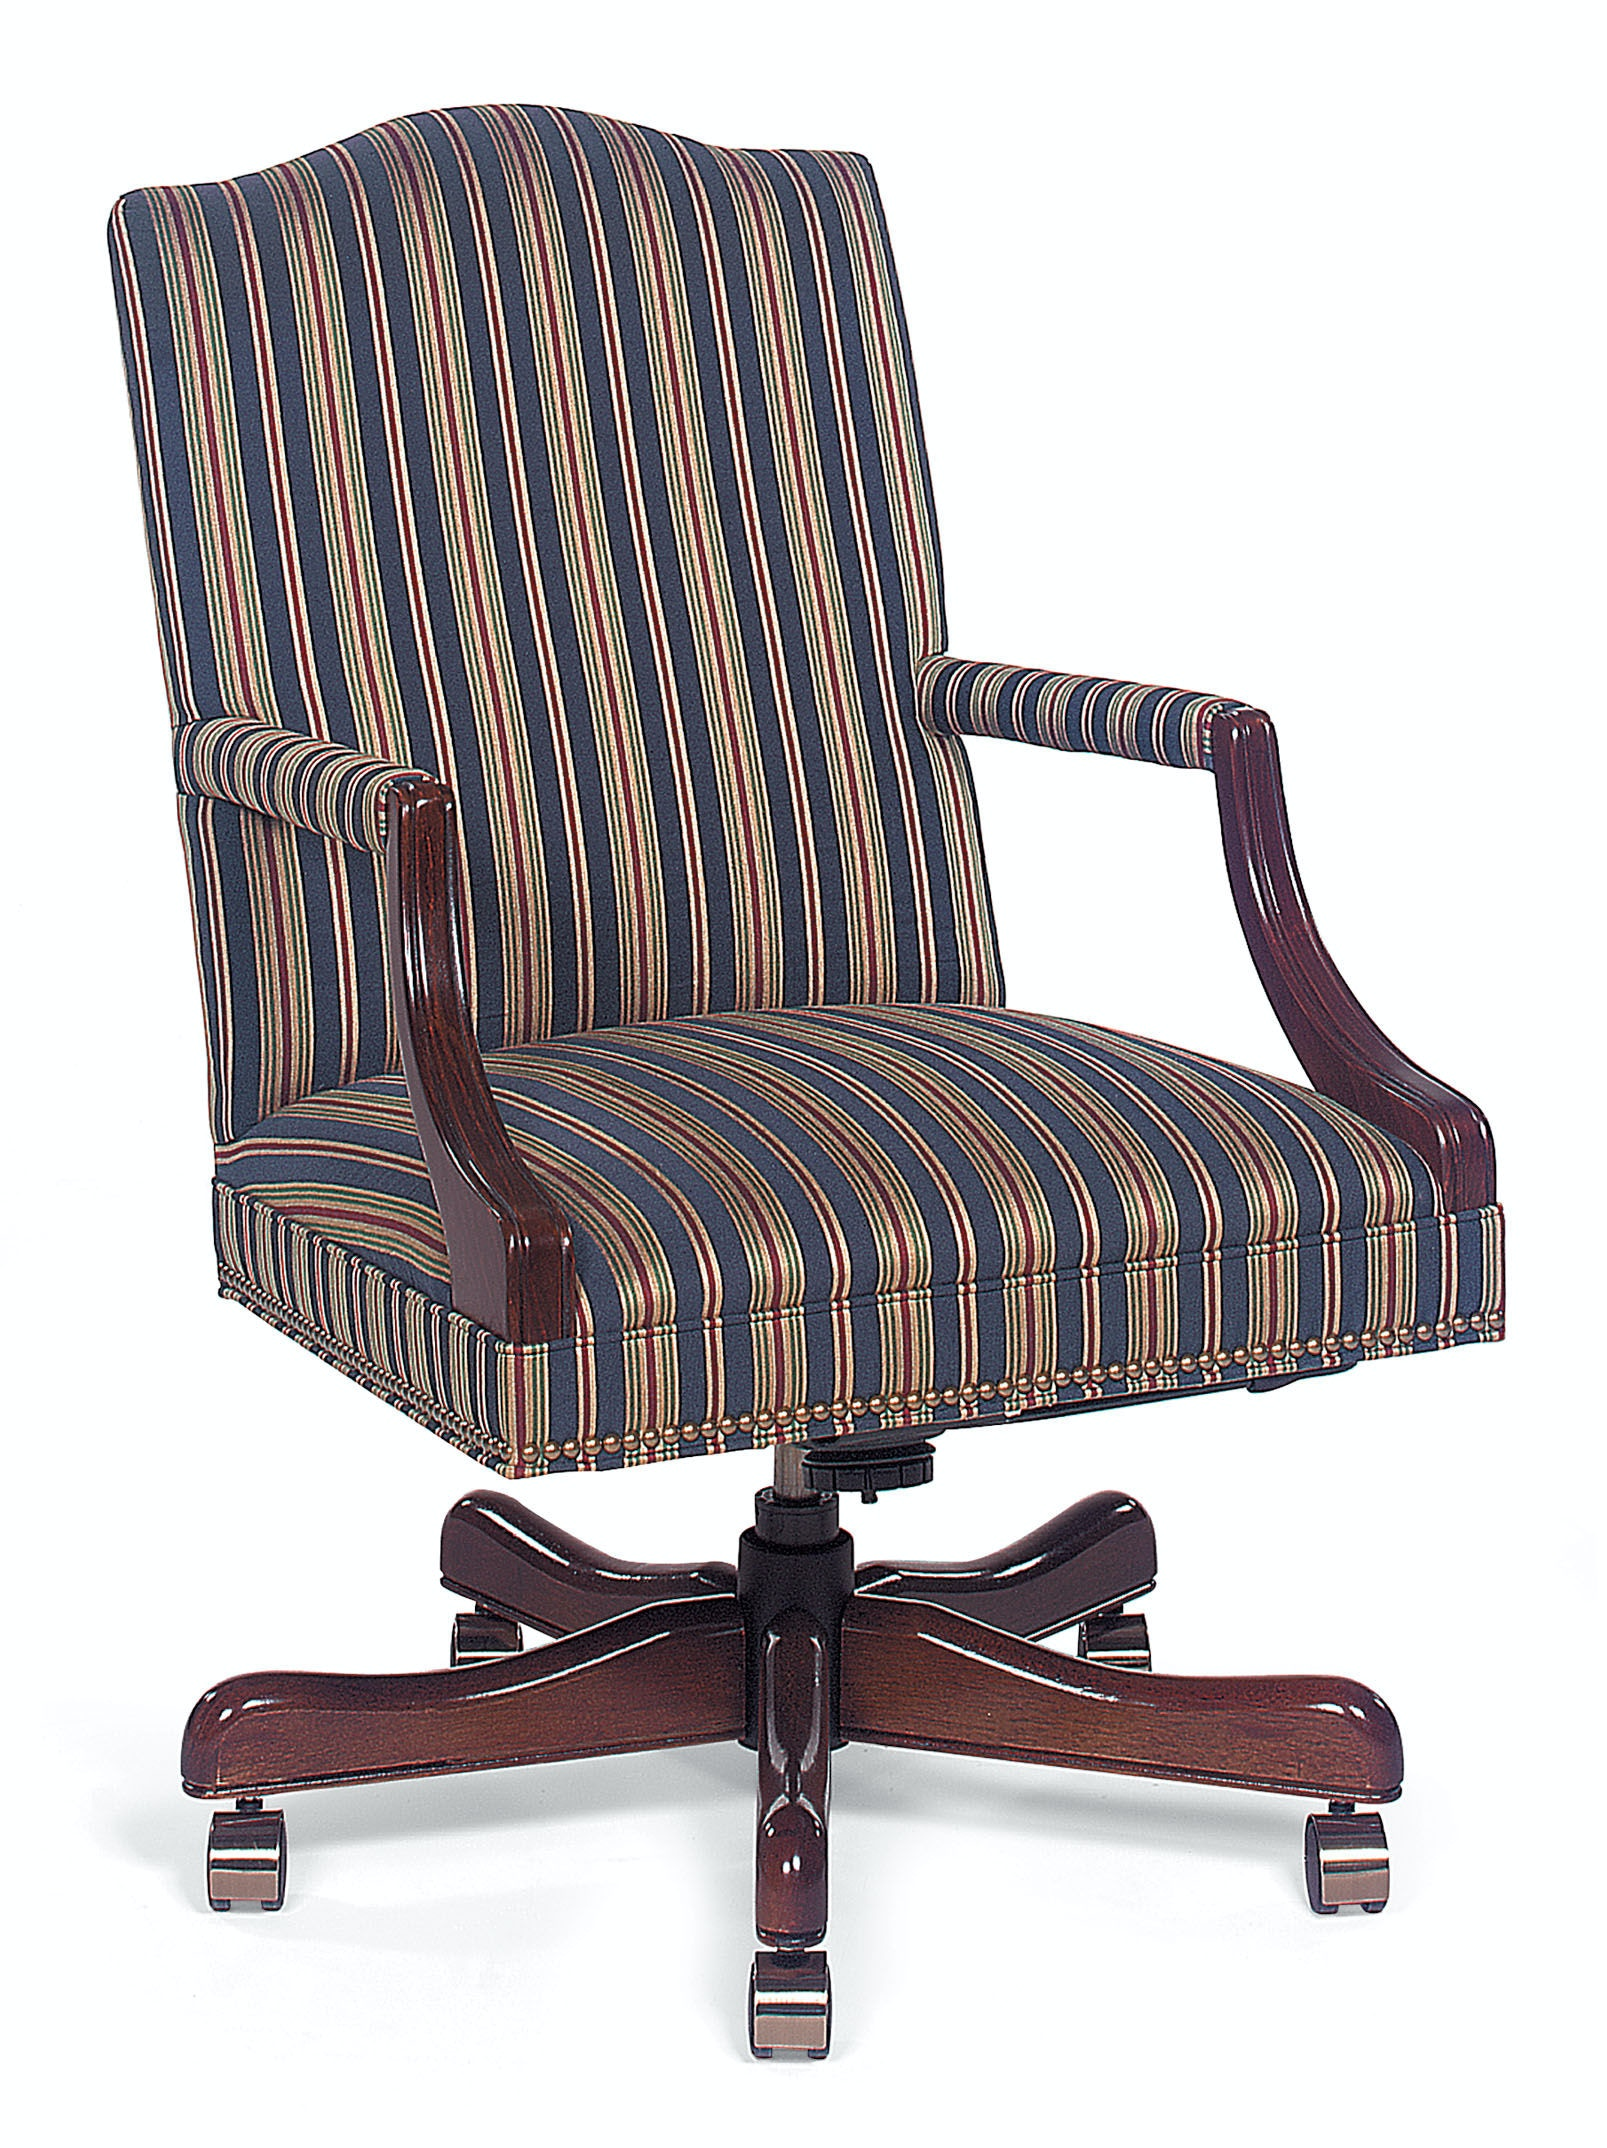 ... Kiser Furniture Abingdon Va By Fairfield Chair Company Home Office  Office Swivel Chair ...